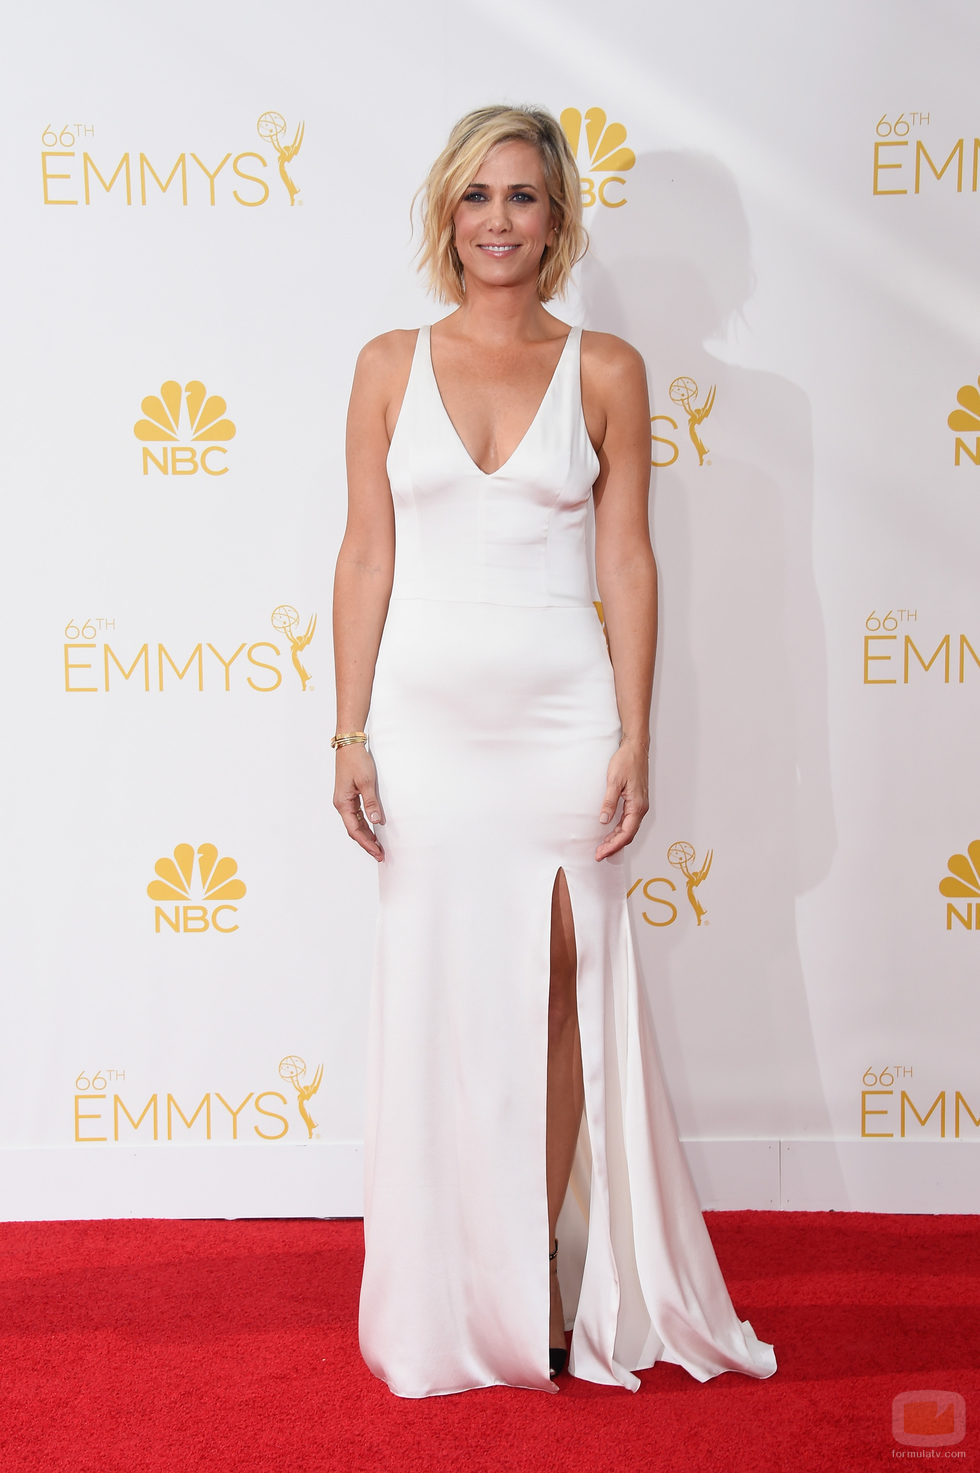 Kristen Wiig en los Emmys 2014: Fotos - FormulaTV